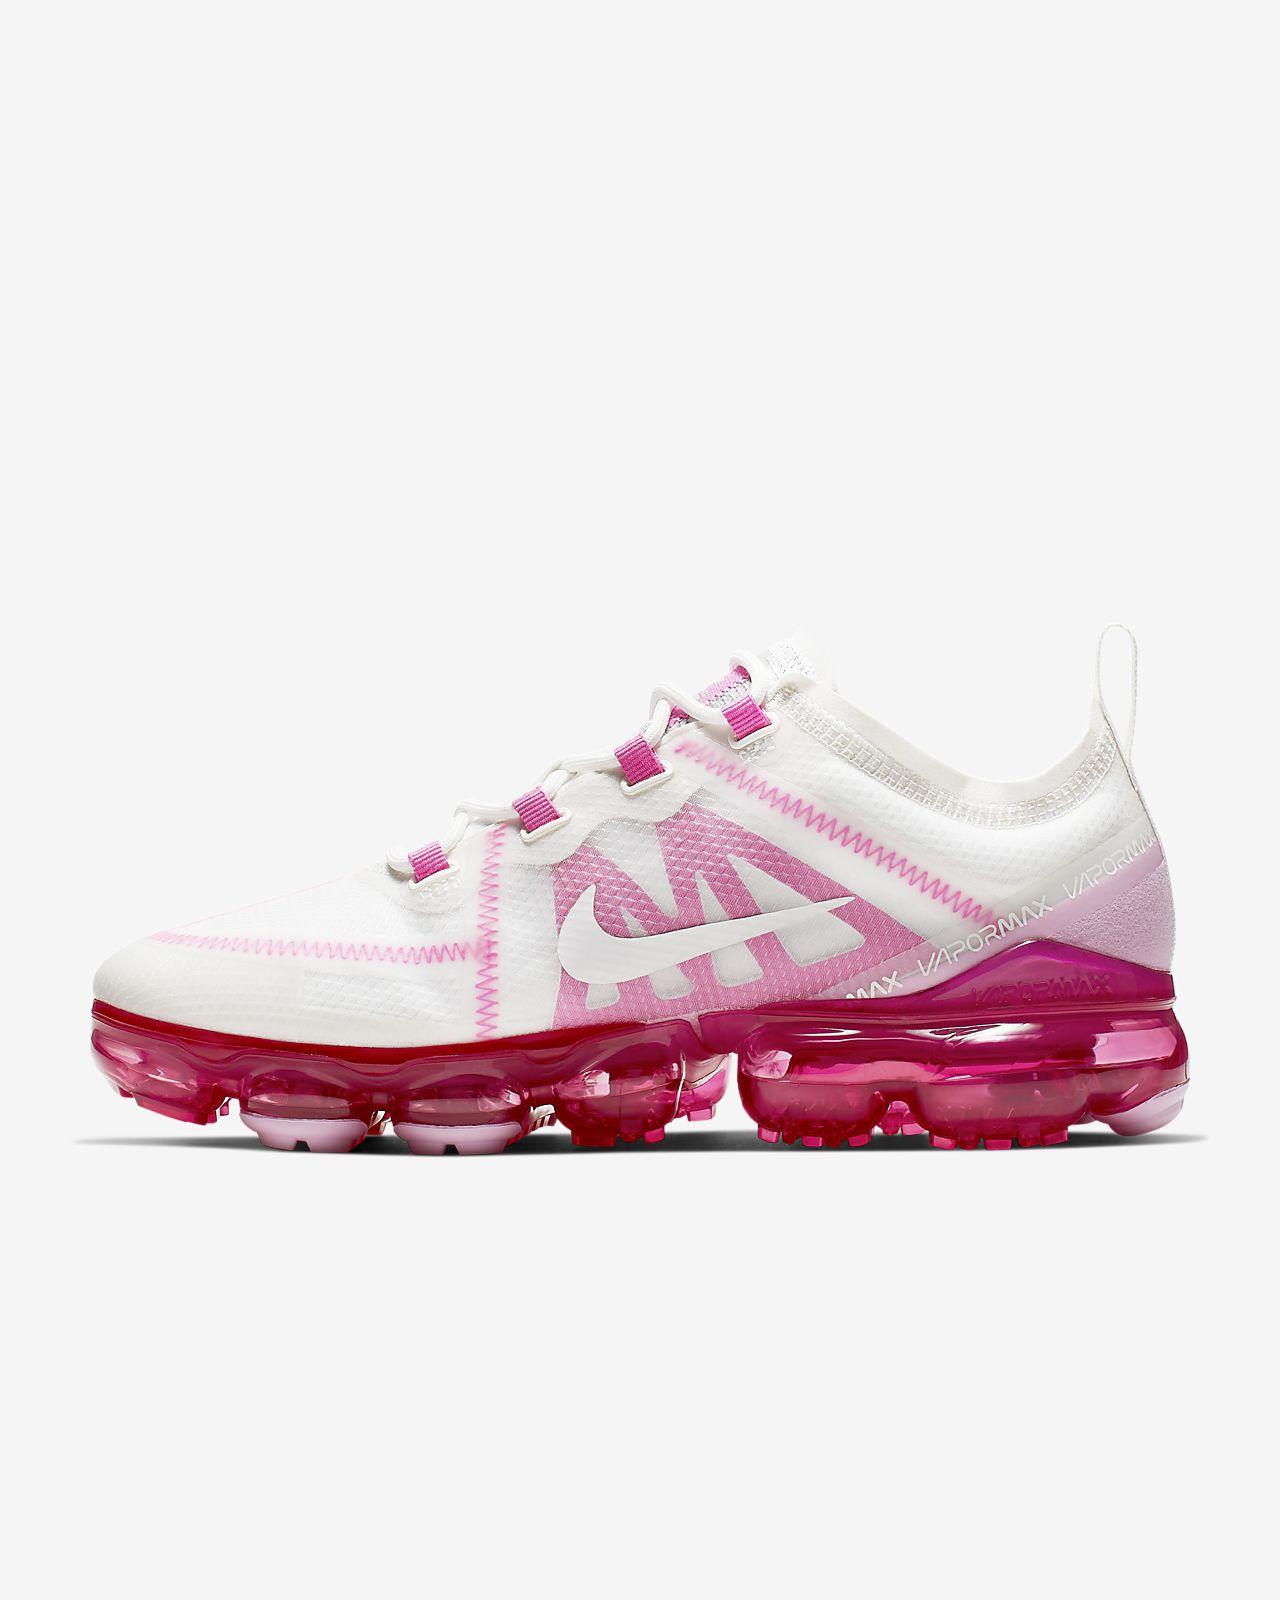 NikeAir VaporMax 2019 女子运动鞋